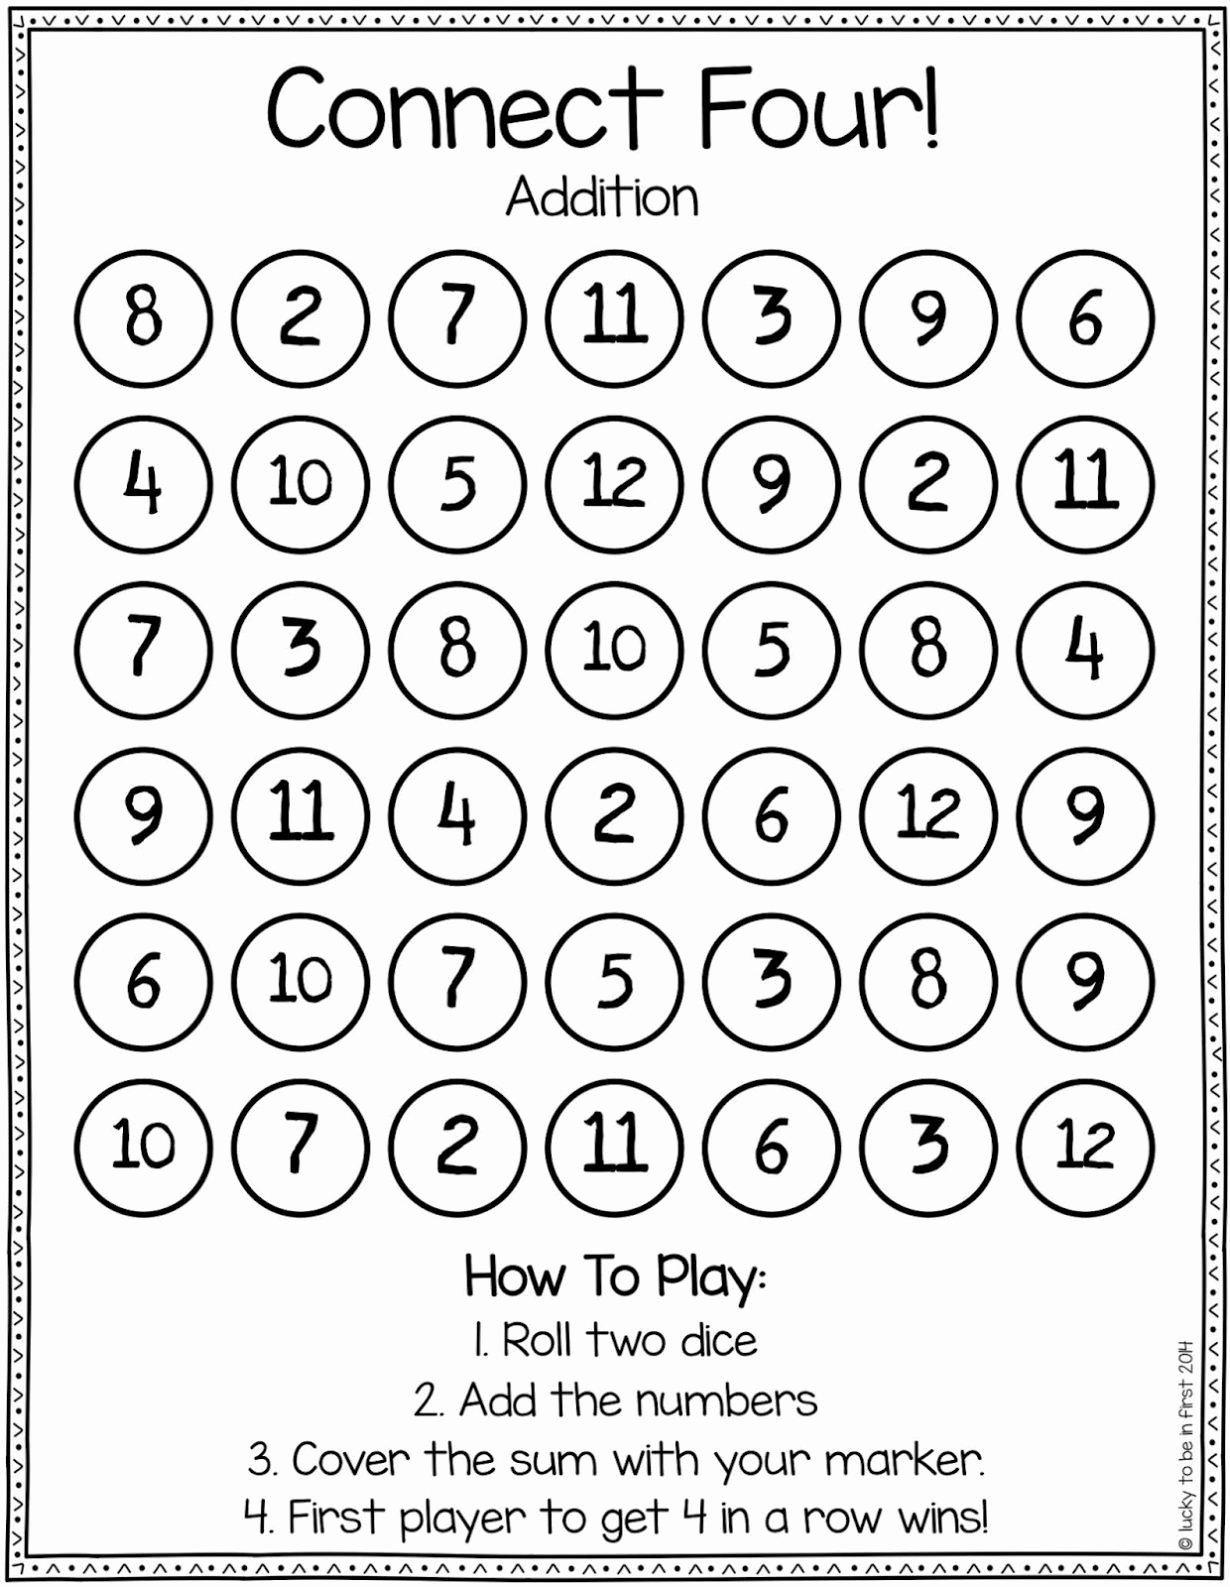 Kumon Math Worksheets for Preschoolers Fresh Worksheets Math Worksheet Games for 2nd Graders Free Ideas